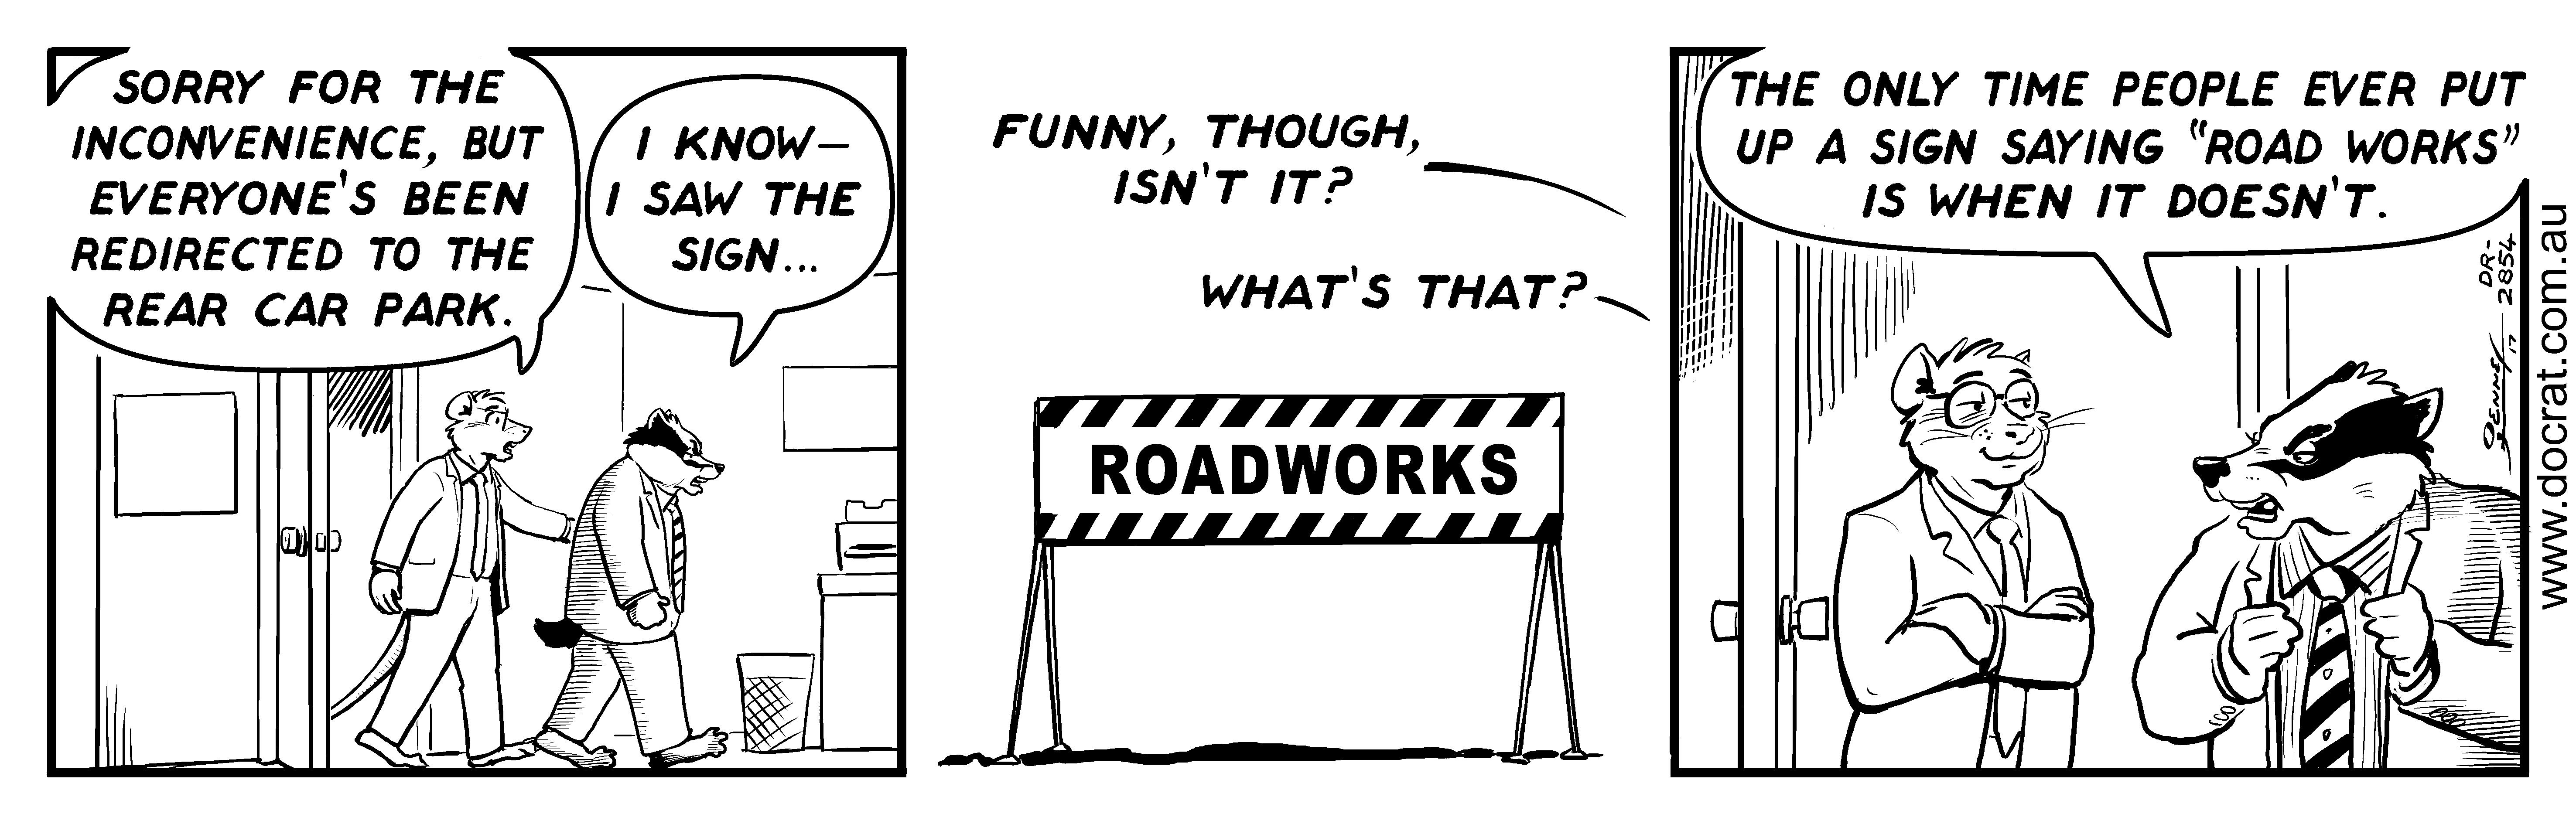 20170831